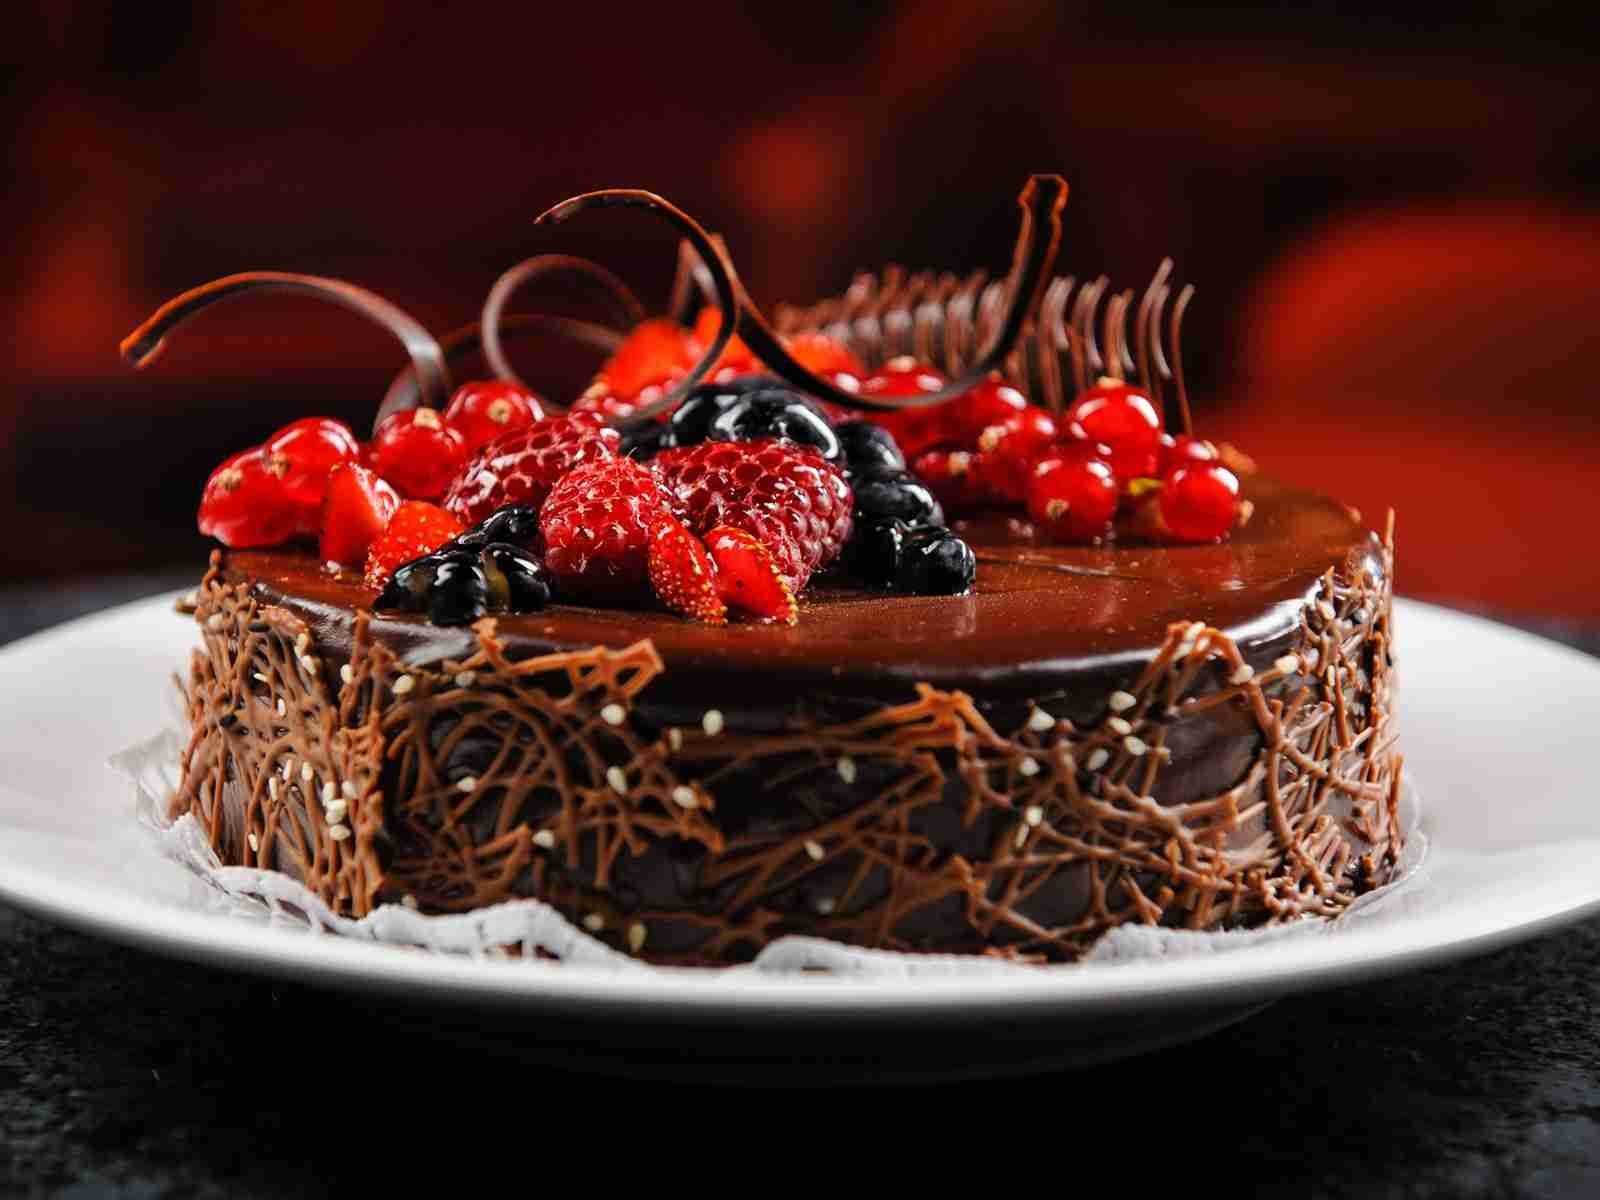 birthday chocolate fruit cake pic more on http://hbdwish